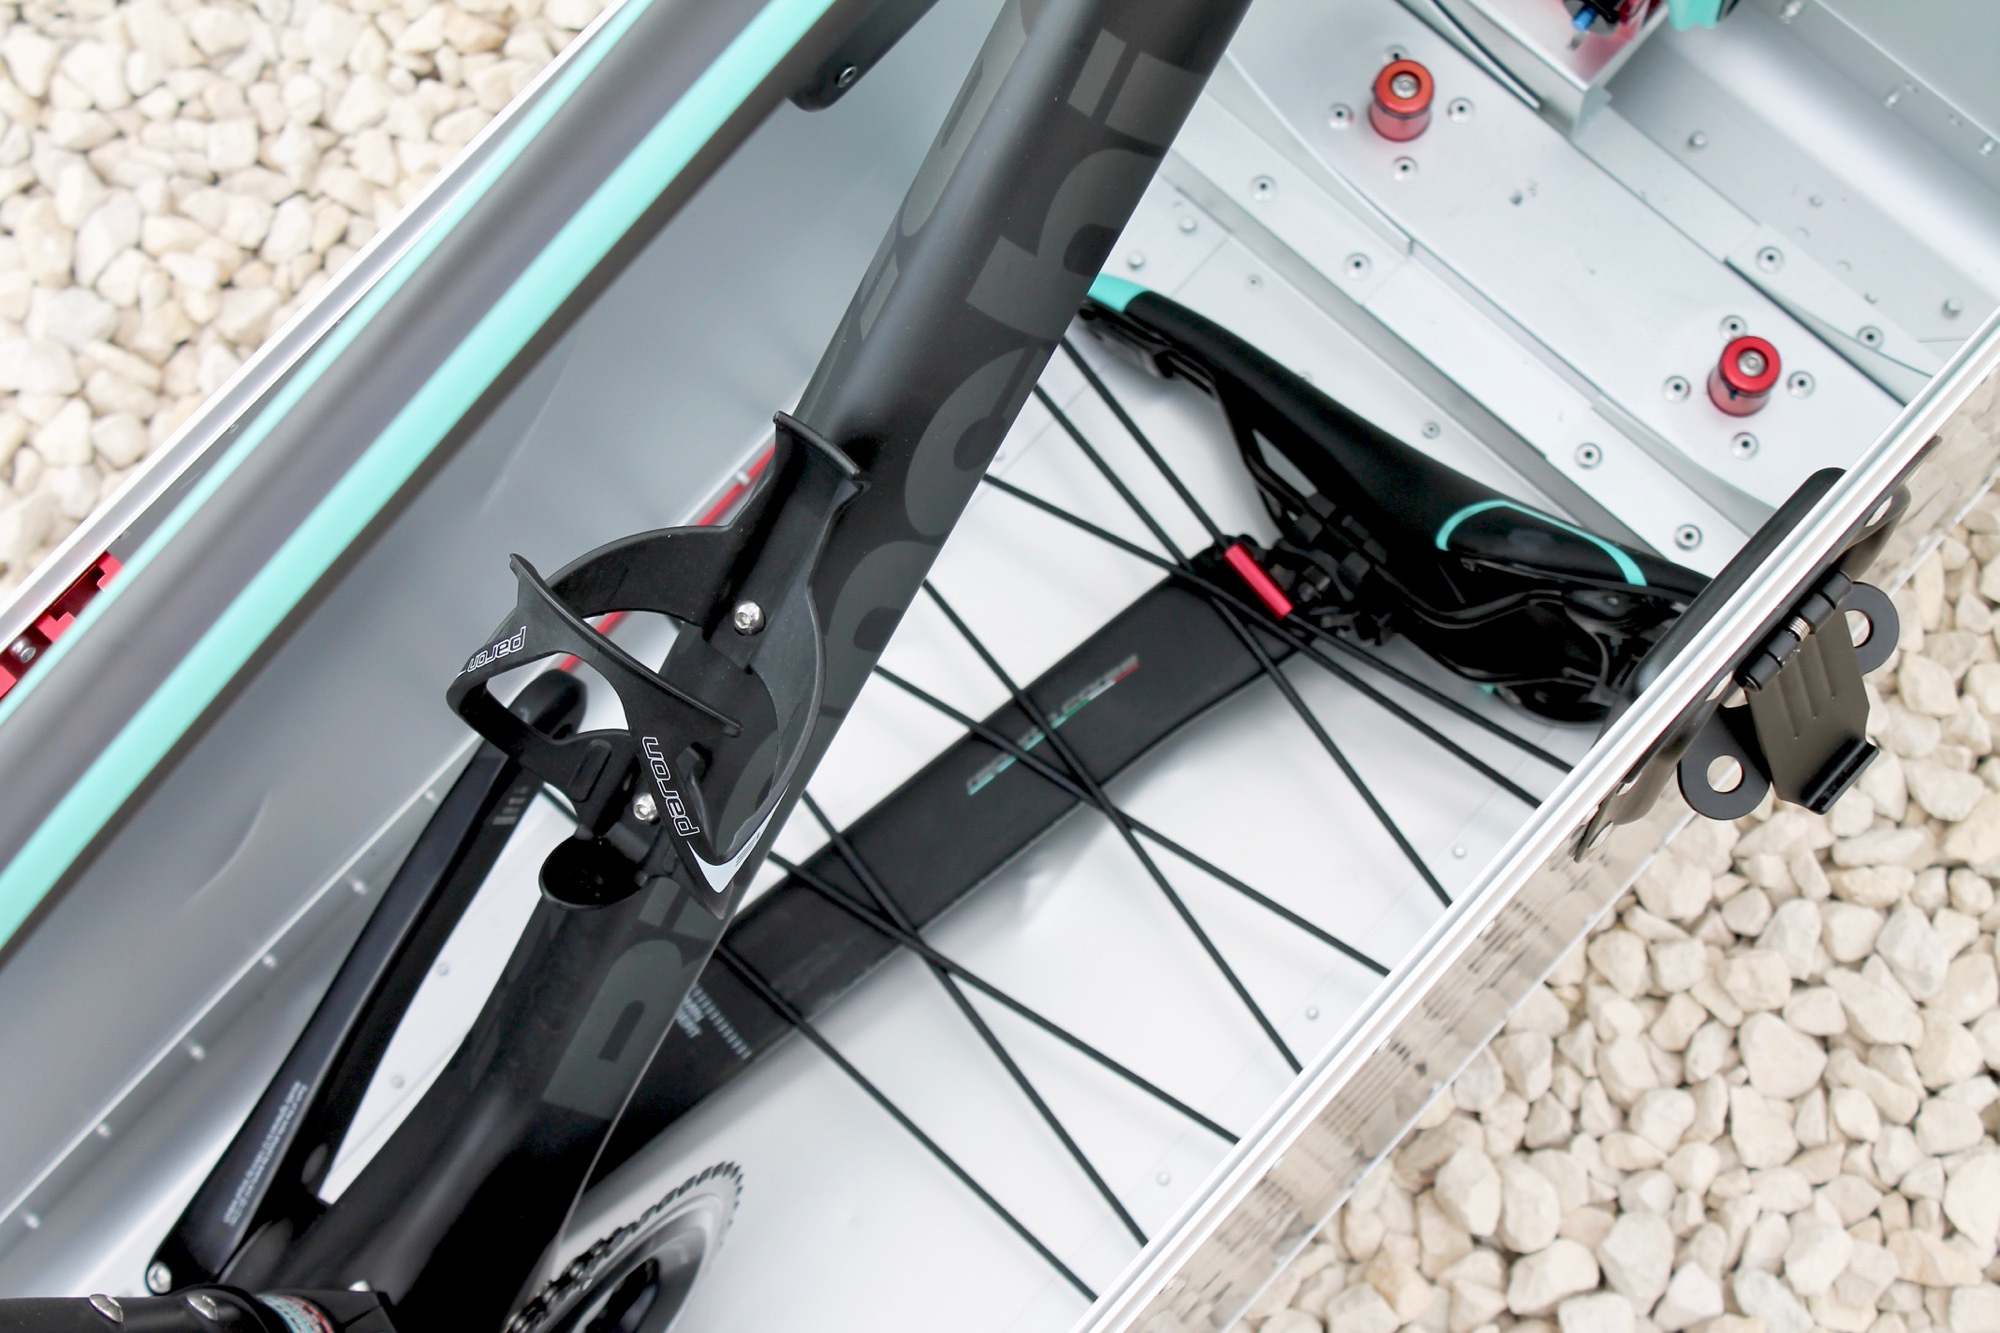 26d4130eab7 Review  Buxumbox Tourmalet bike box